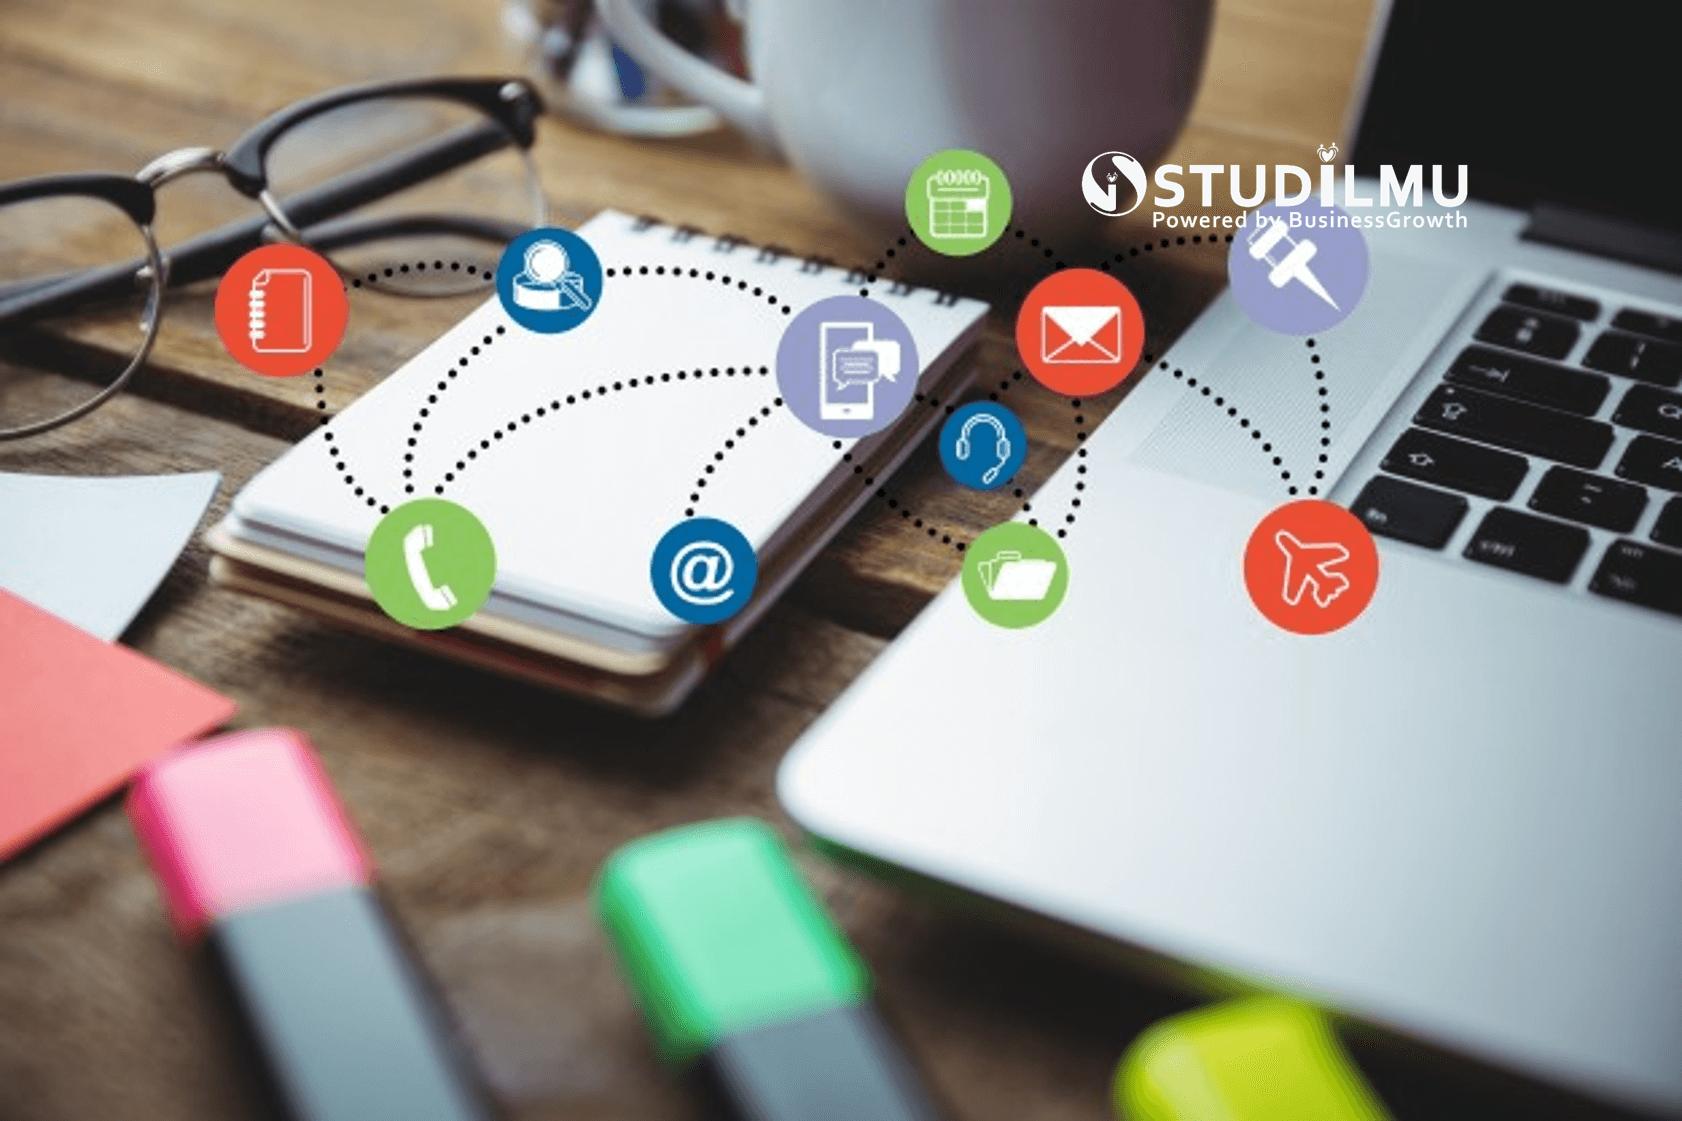 STUDILMU Career Advice - 5 Strategi Pemasaran melalui E-mail